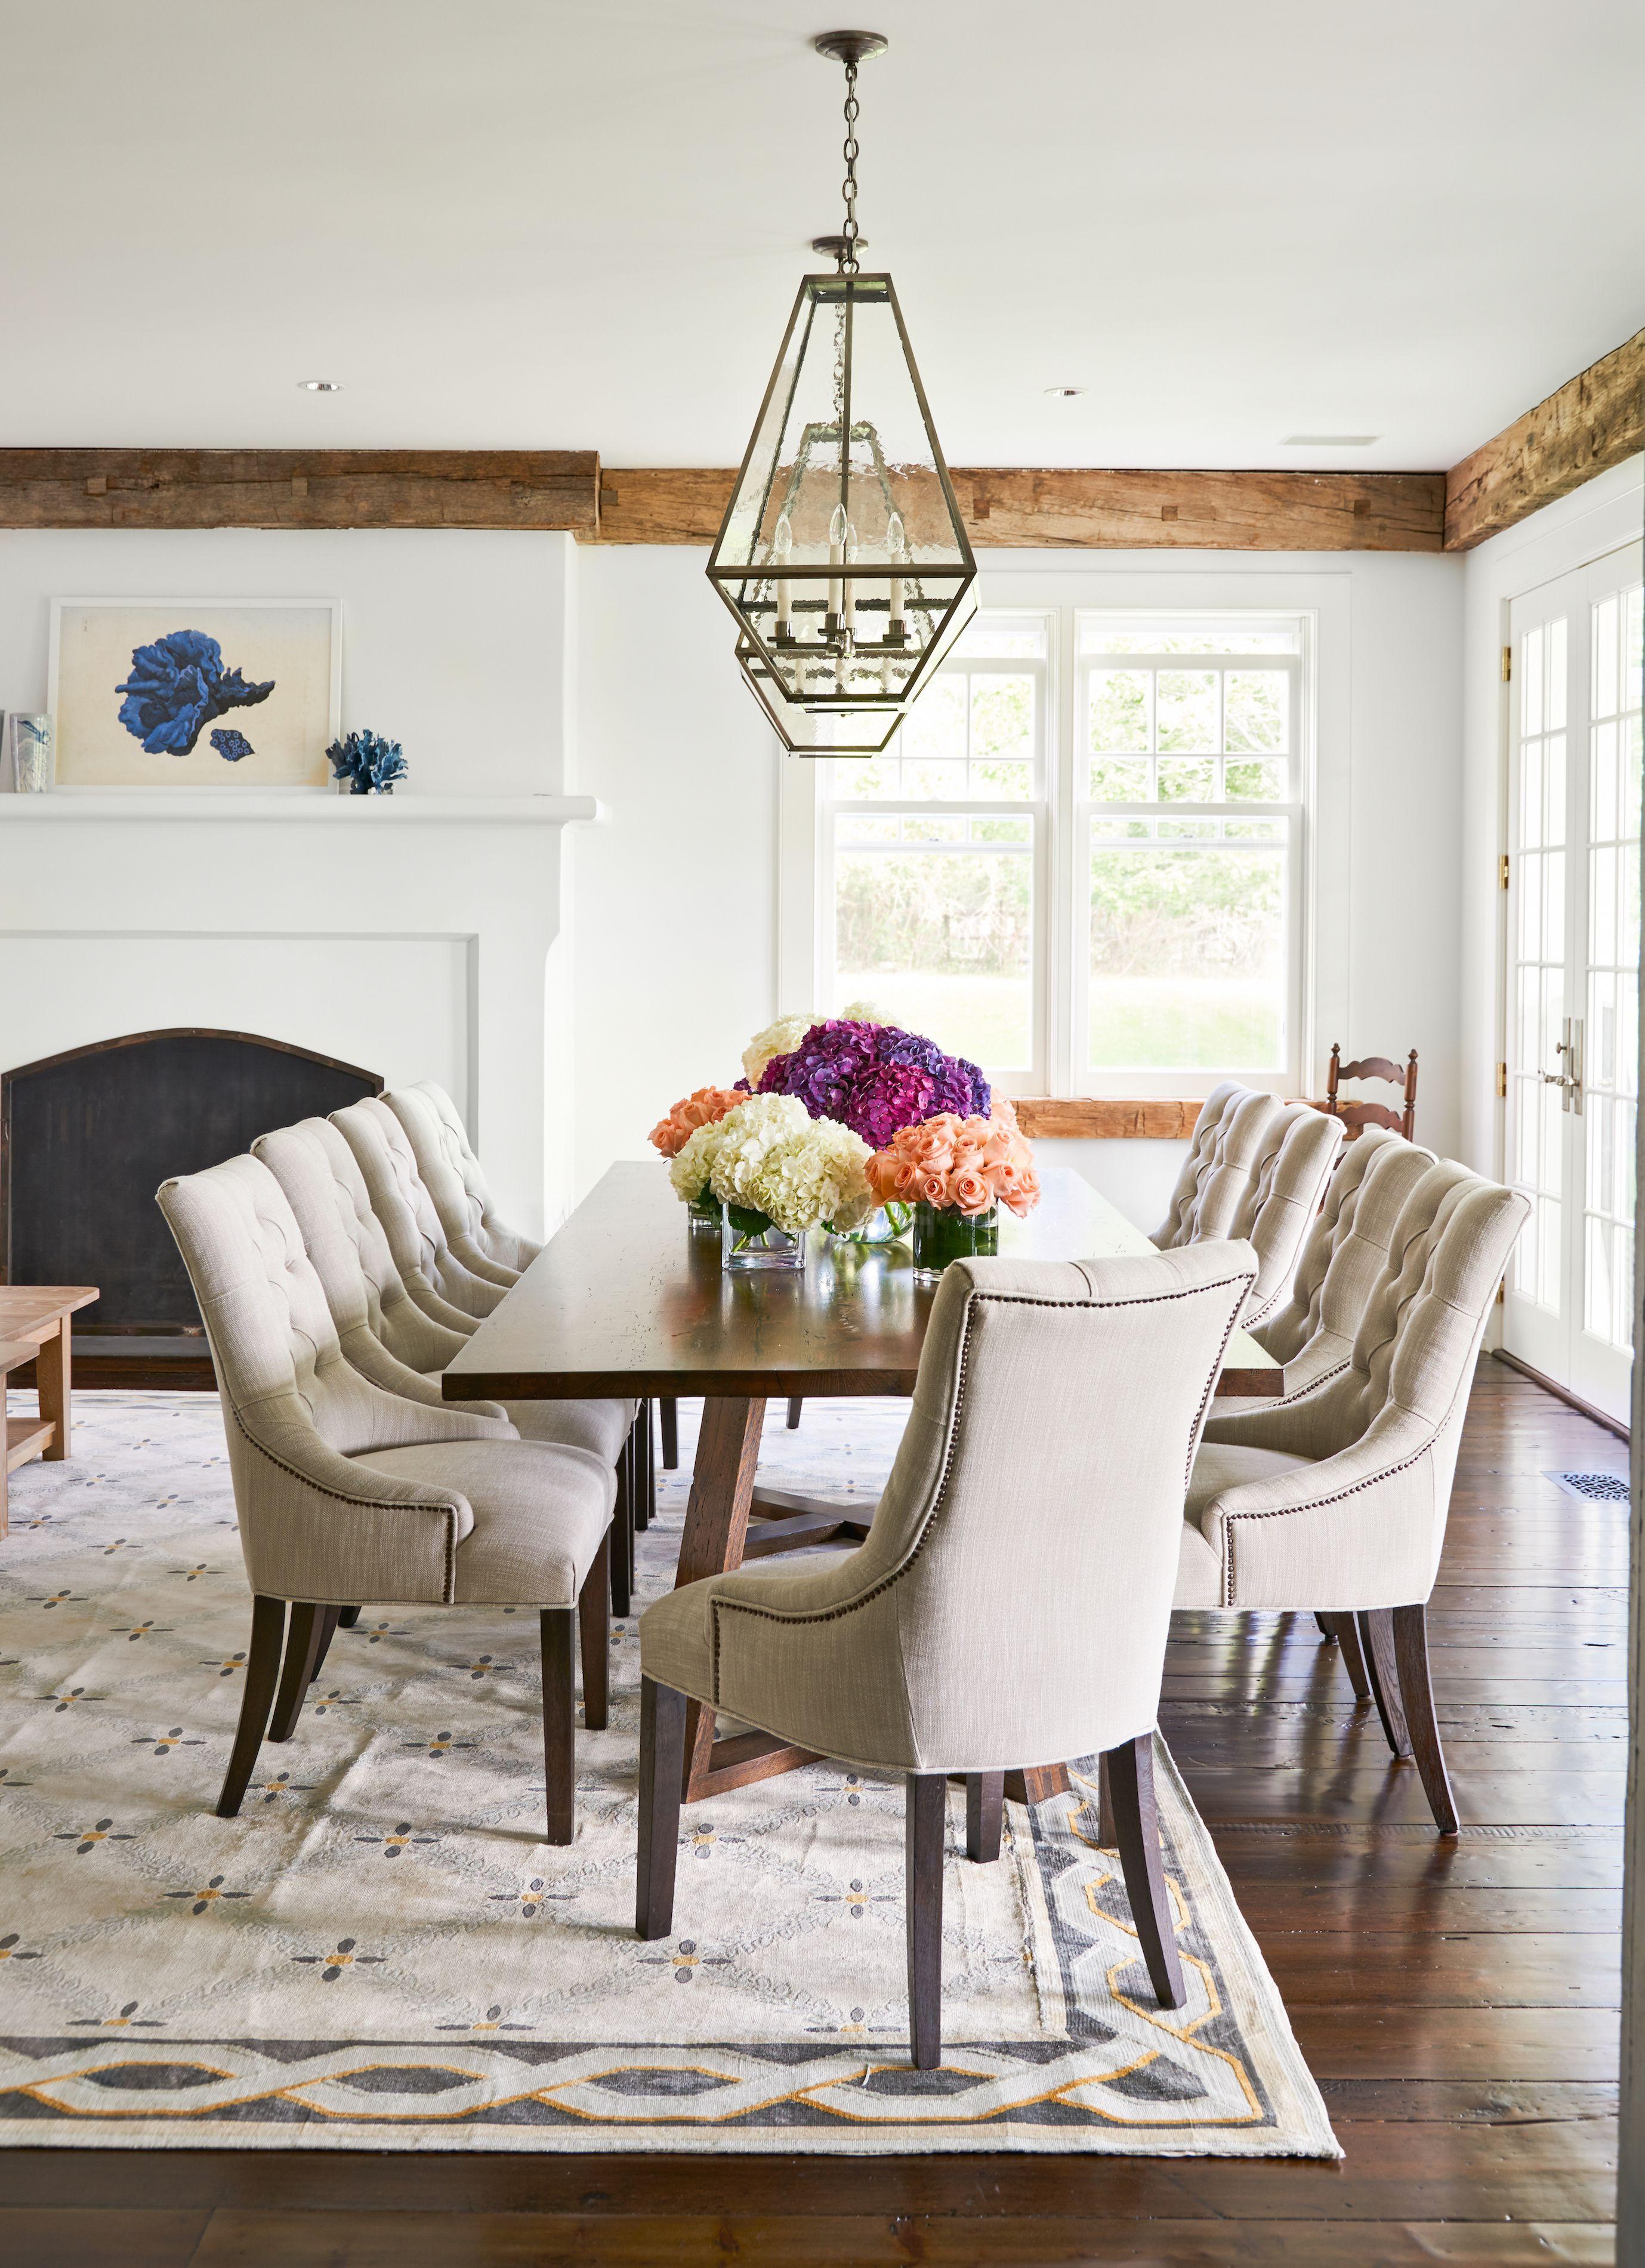 Tour Alec Baldwin And Hilaria Baldwinu0027s House In The Hamptons   East Hampton  Celebrity Homes